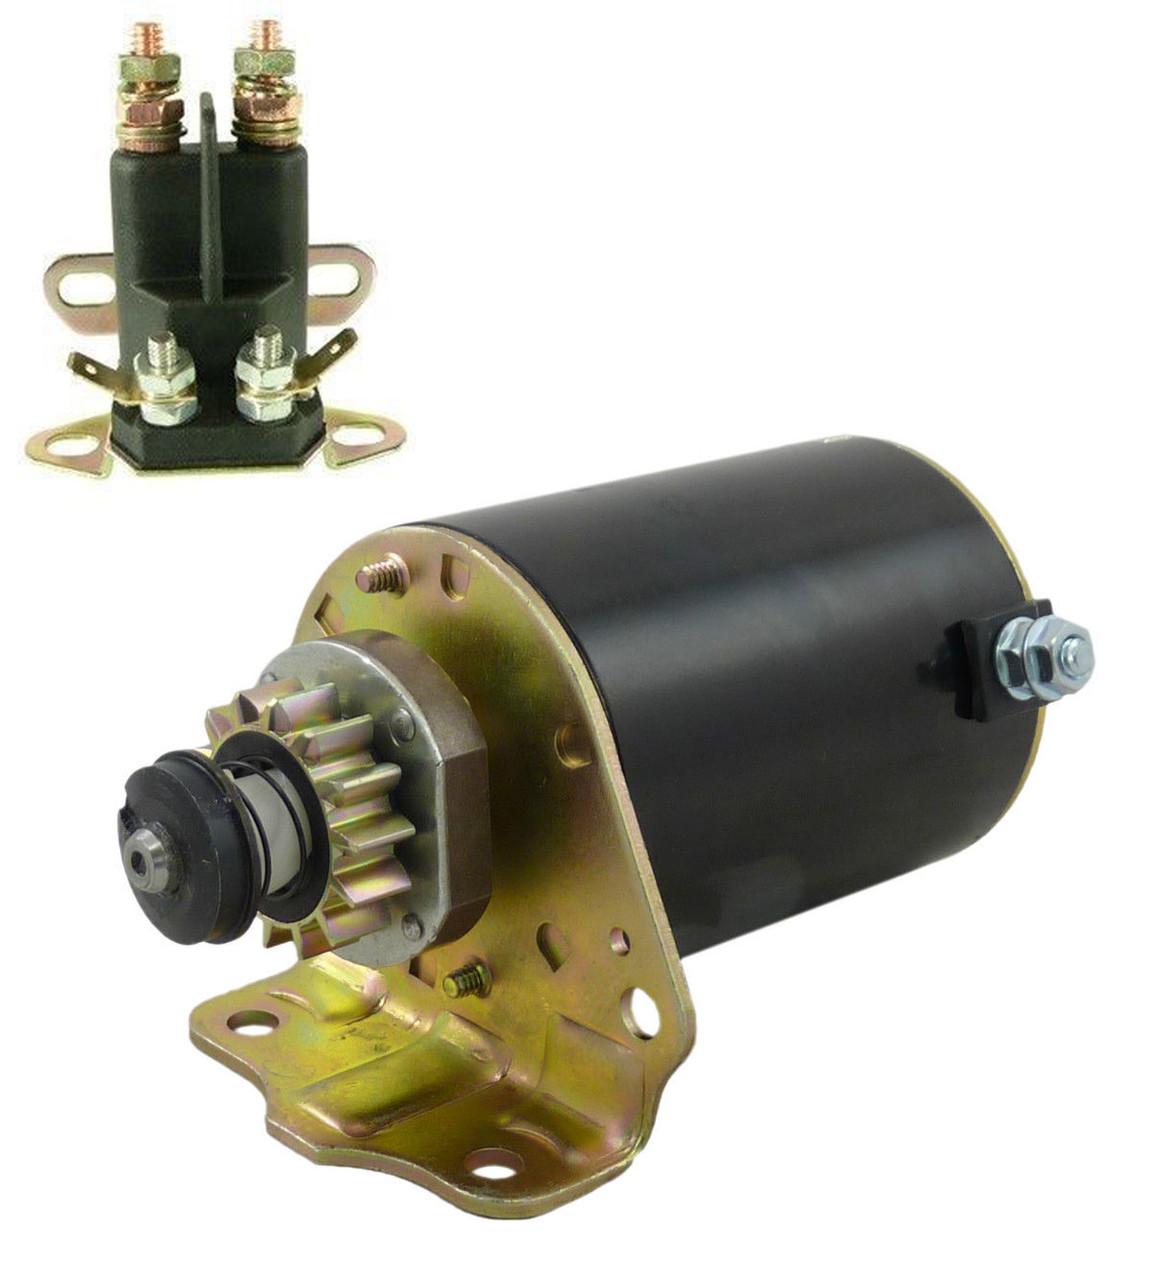 2082 Cub Cadet Wiring Harness. . Wiring Diagram Range Diagram Electrical Wiring Kenmore on